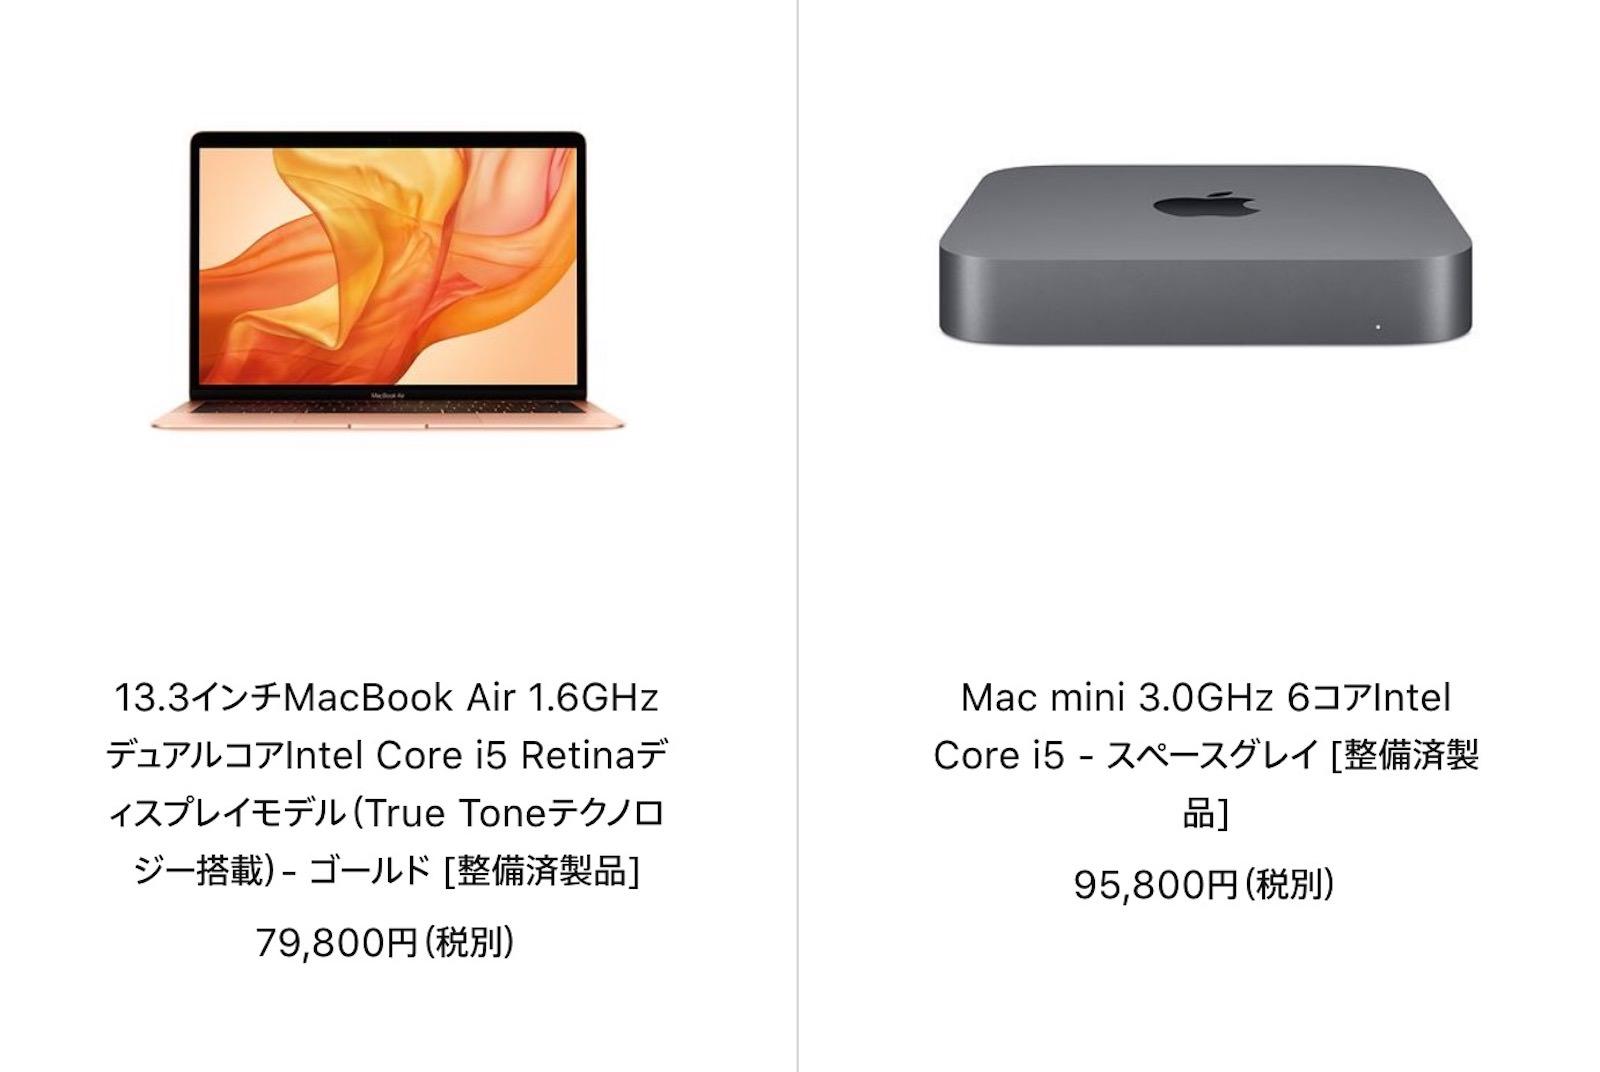 Mac mini and MacBook Air